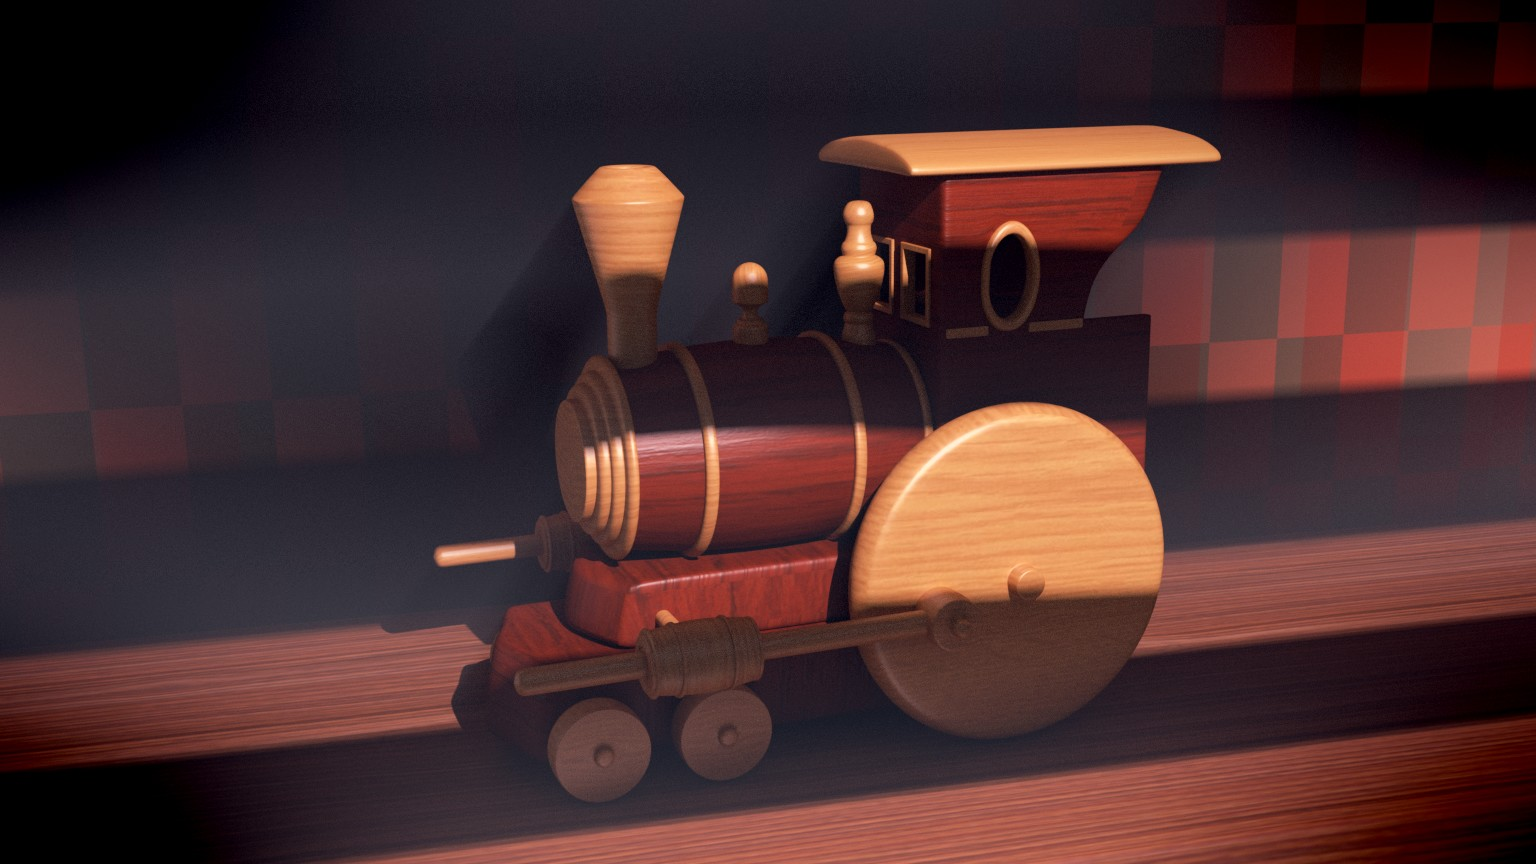 Tren madera juguete 2-trenecito_7_luces.jpg